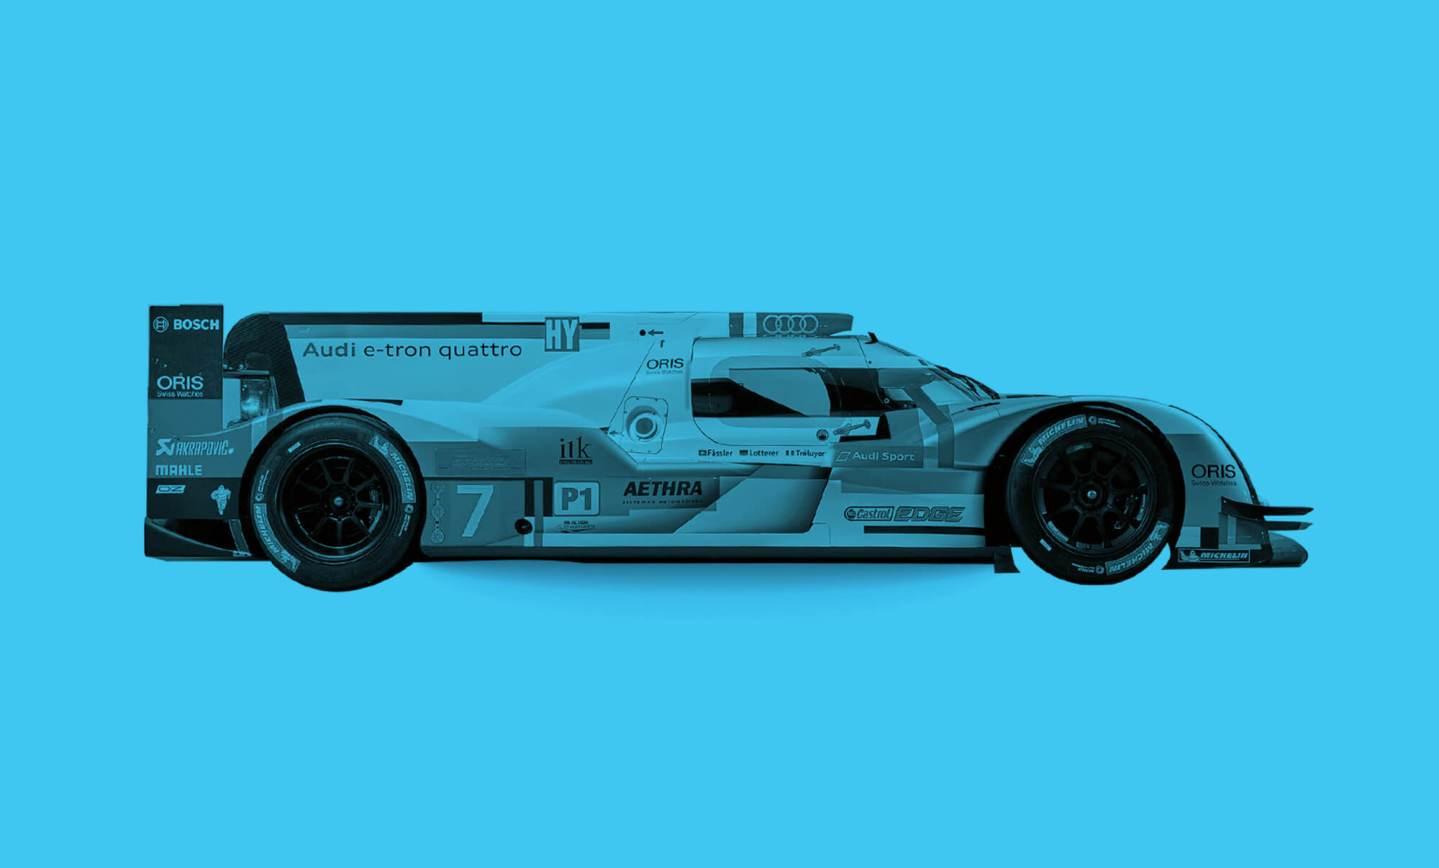 Audi TDI: conheça a história de seus motores